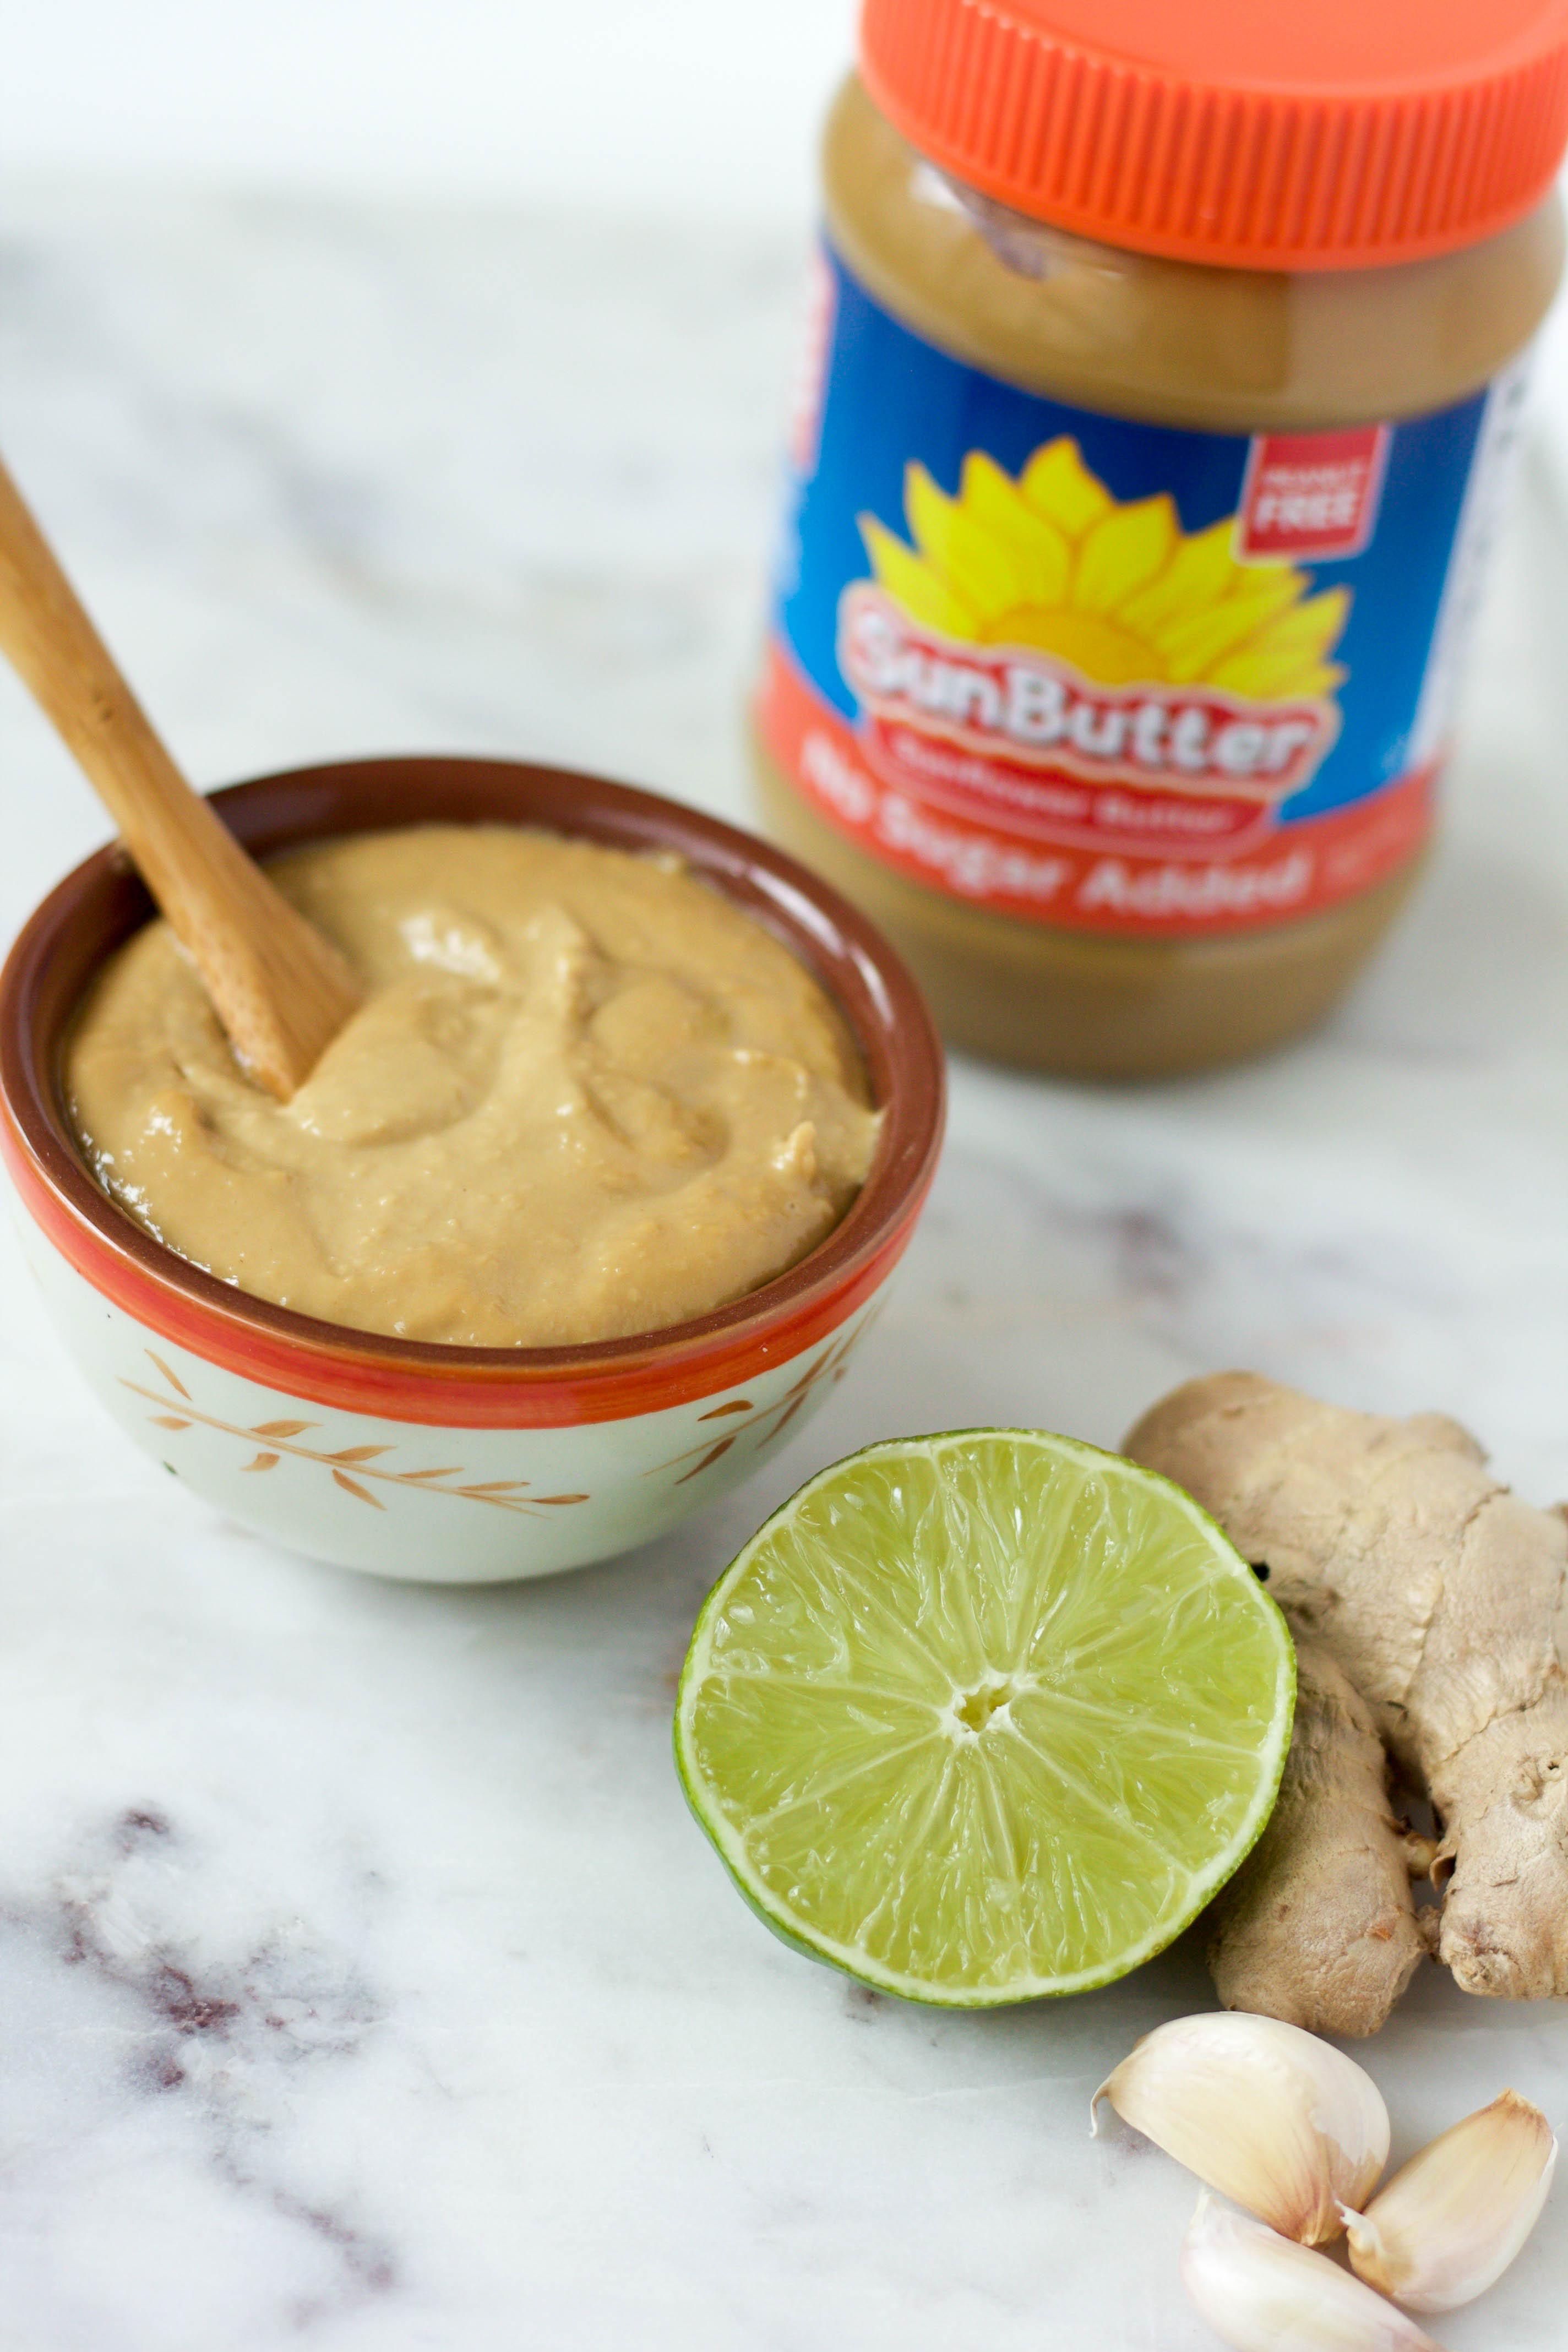 nut-free thai sauce feat. sunbutter